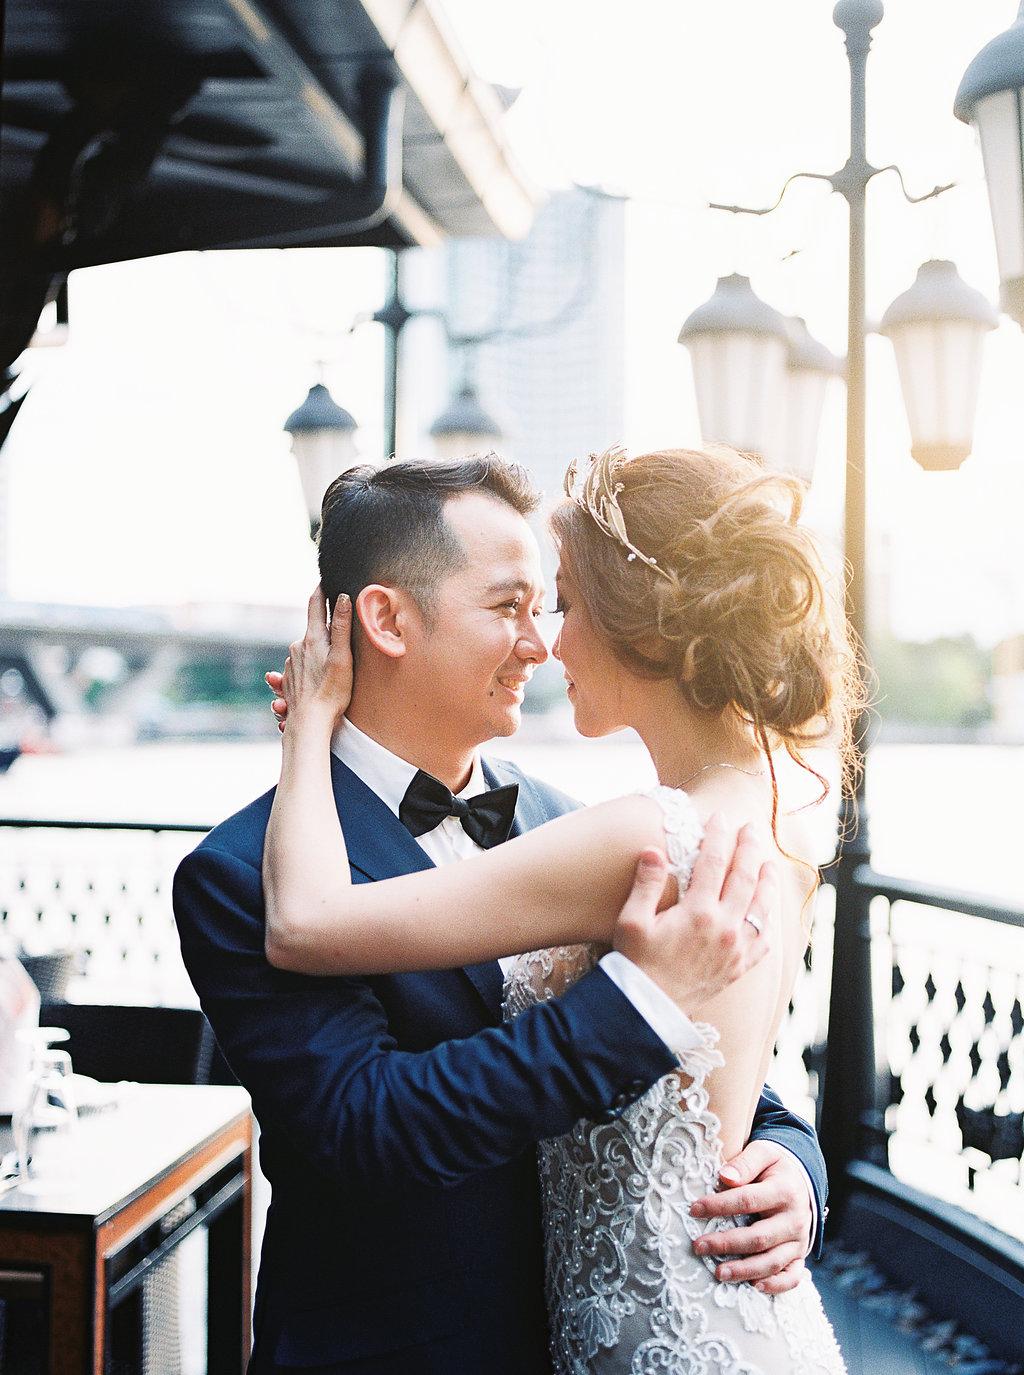 Luxe destination wedding in Jakarta and Bankok   fine art film wedding photographer Tanja Kibogo 5003.JPG